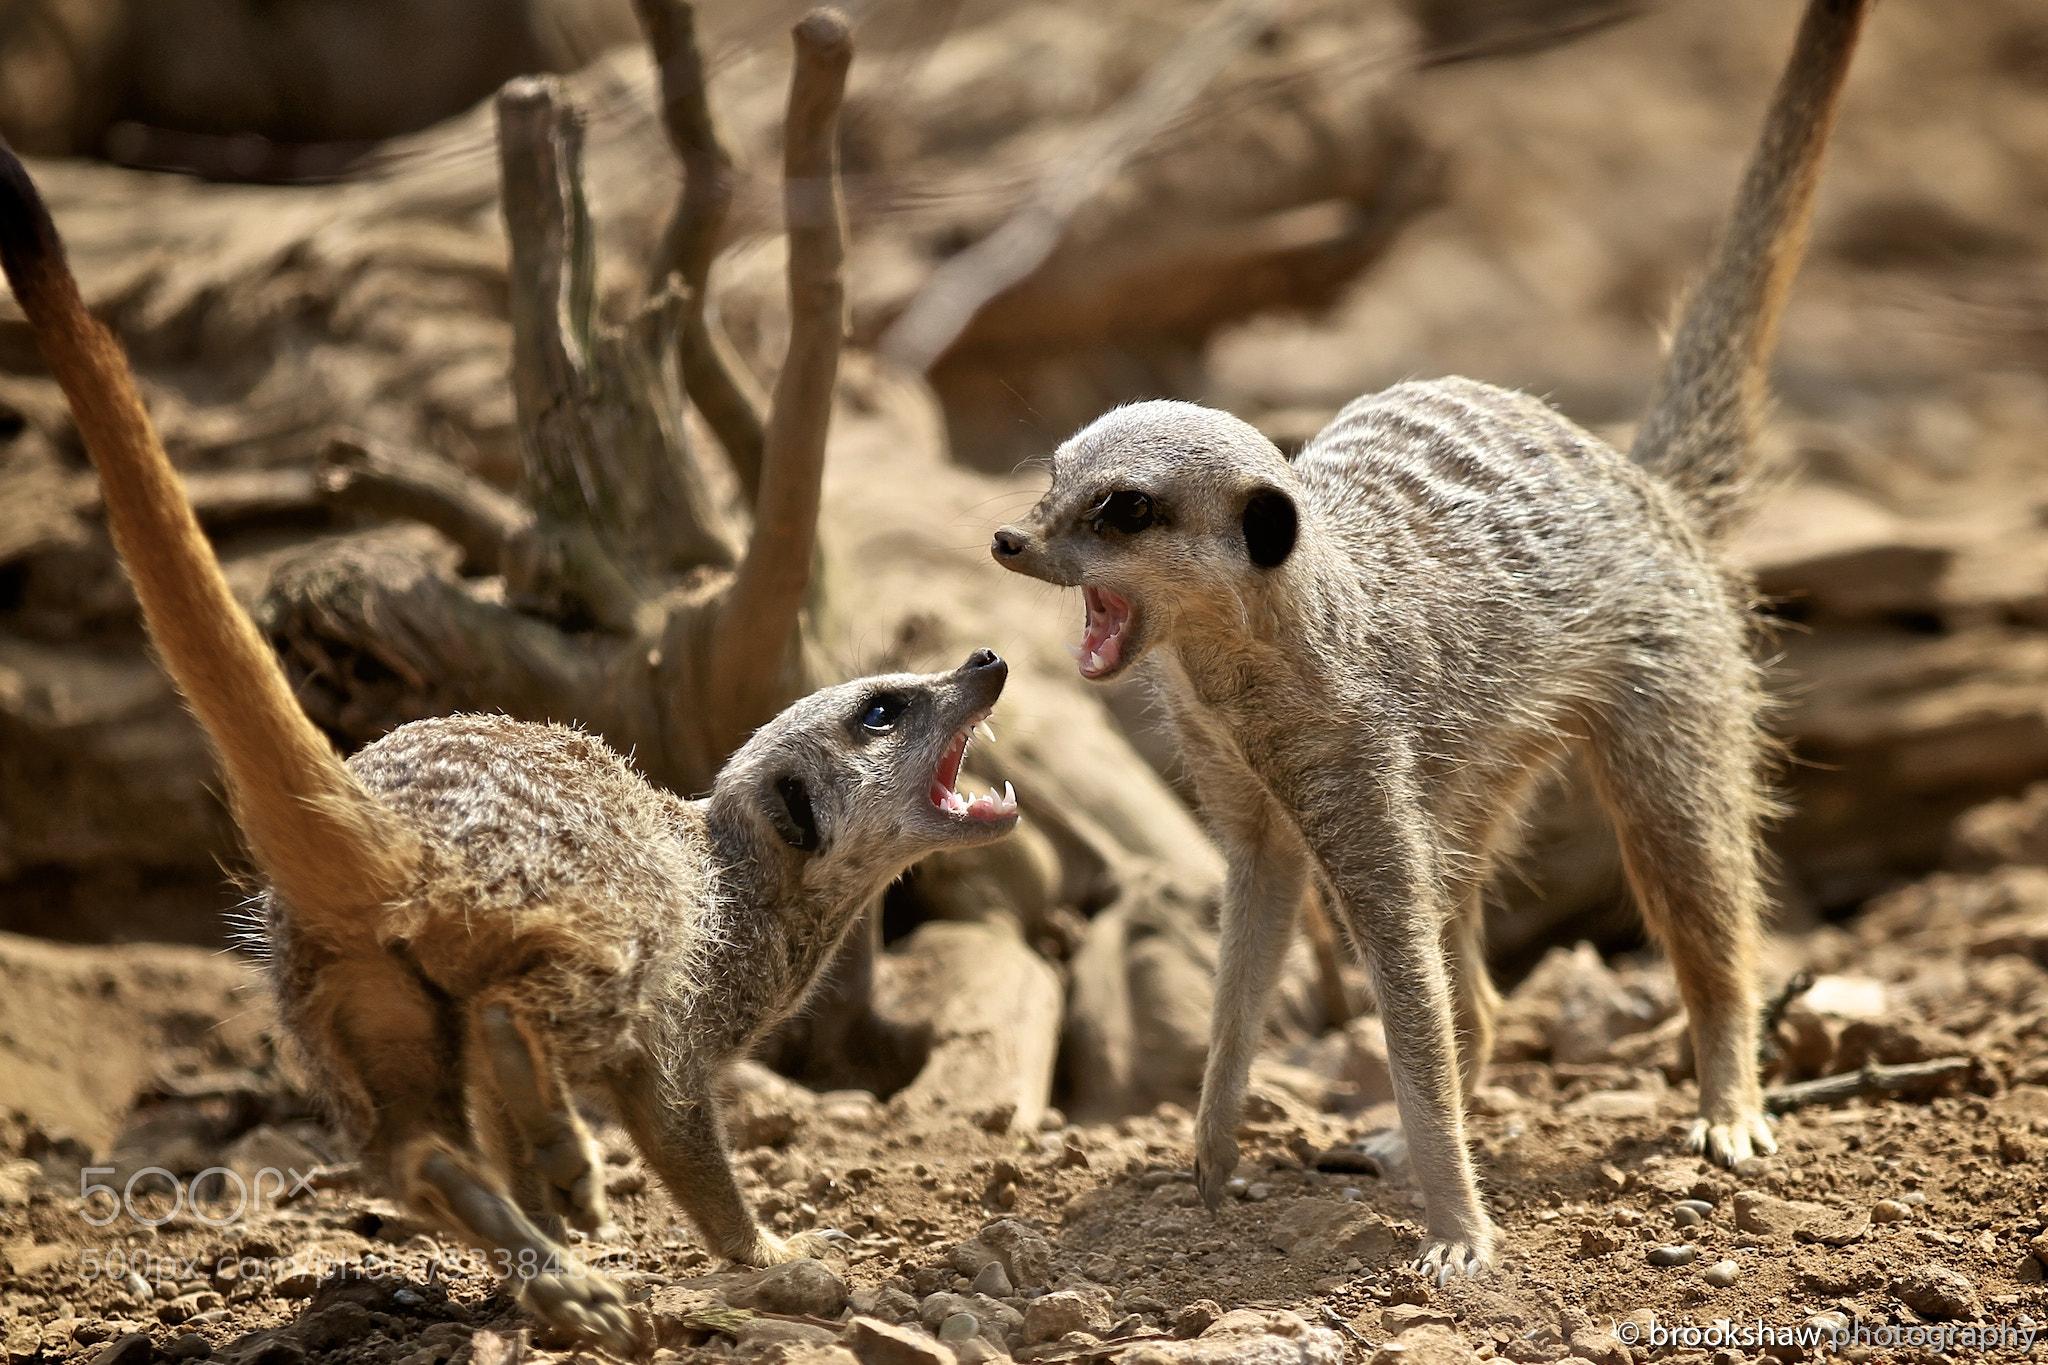 Photograph Cute Meerkats?! by Gary Brookshaw on 500px